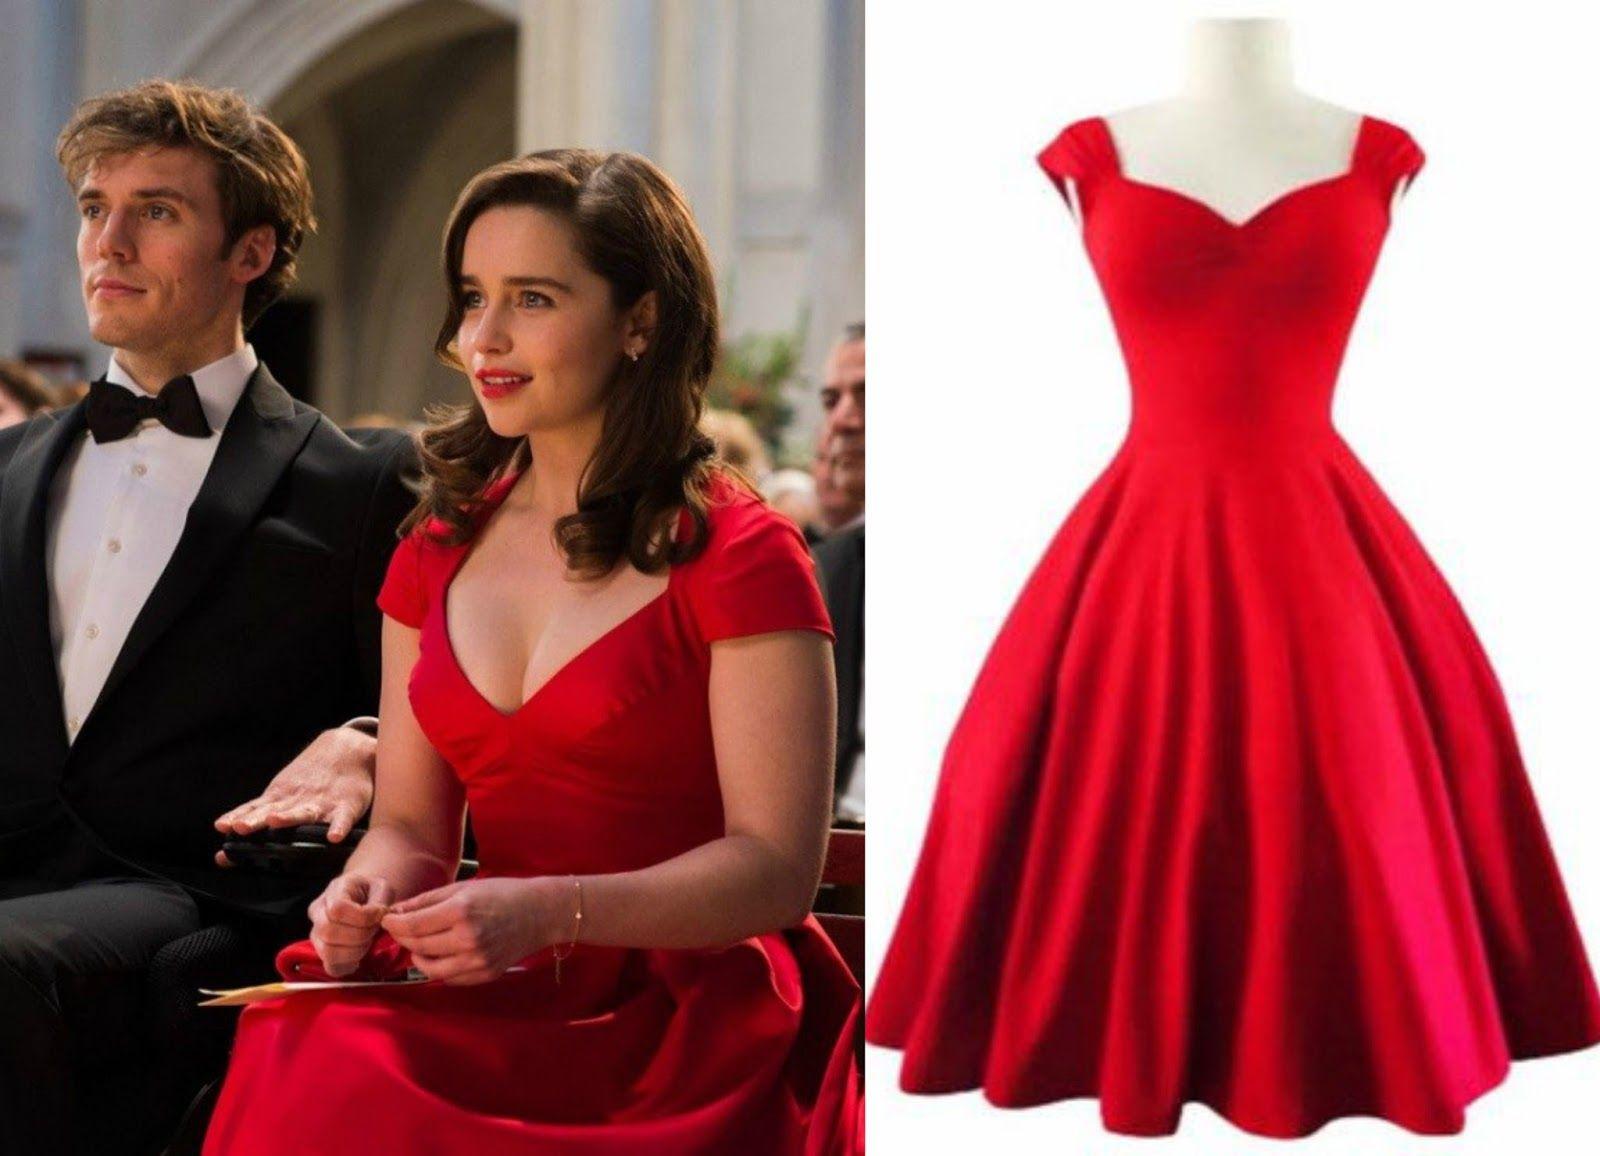 501d5e0148859e Image result for me before you movie - costumes. Emilia Clarke Grad Dresses,  Cute Red ...